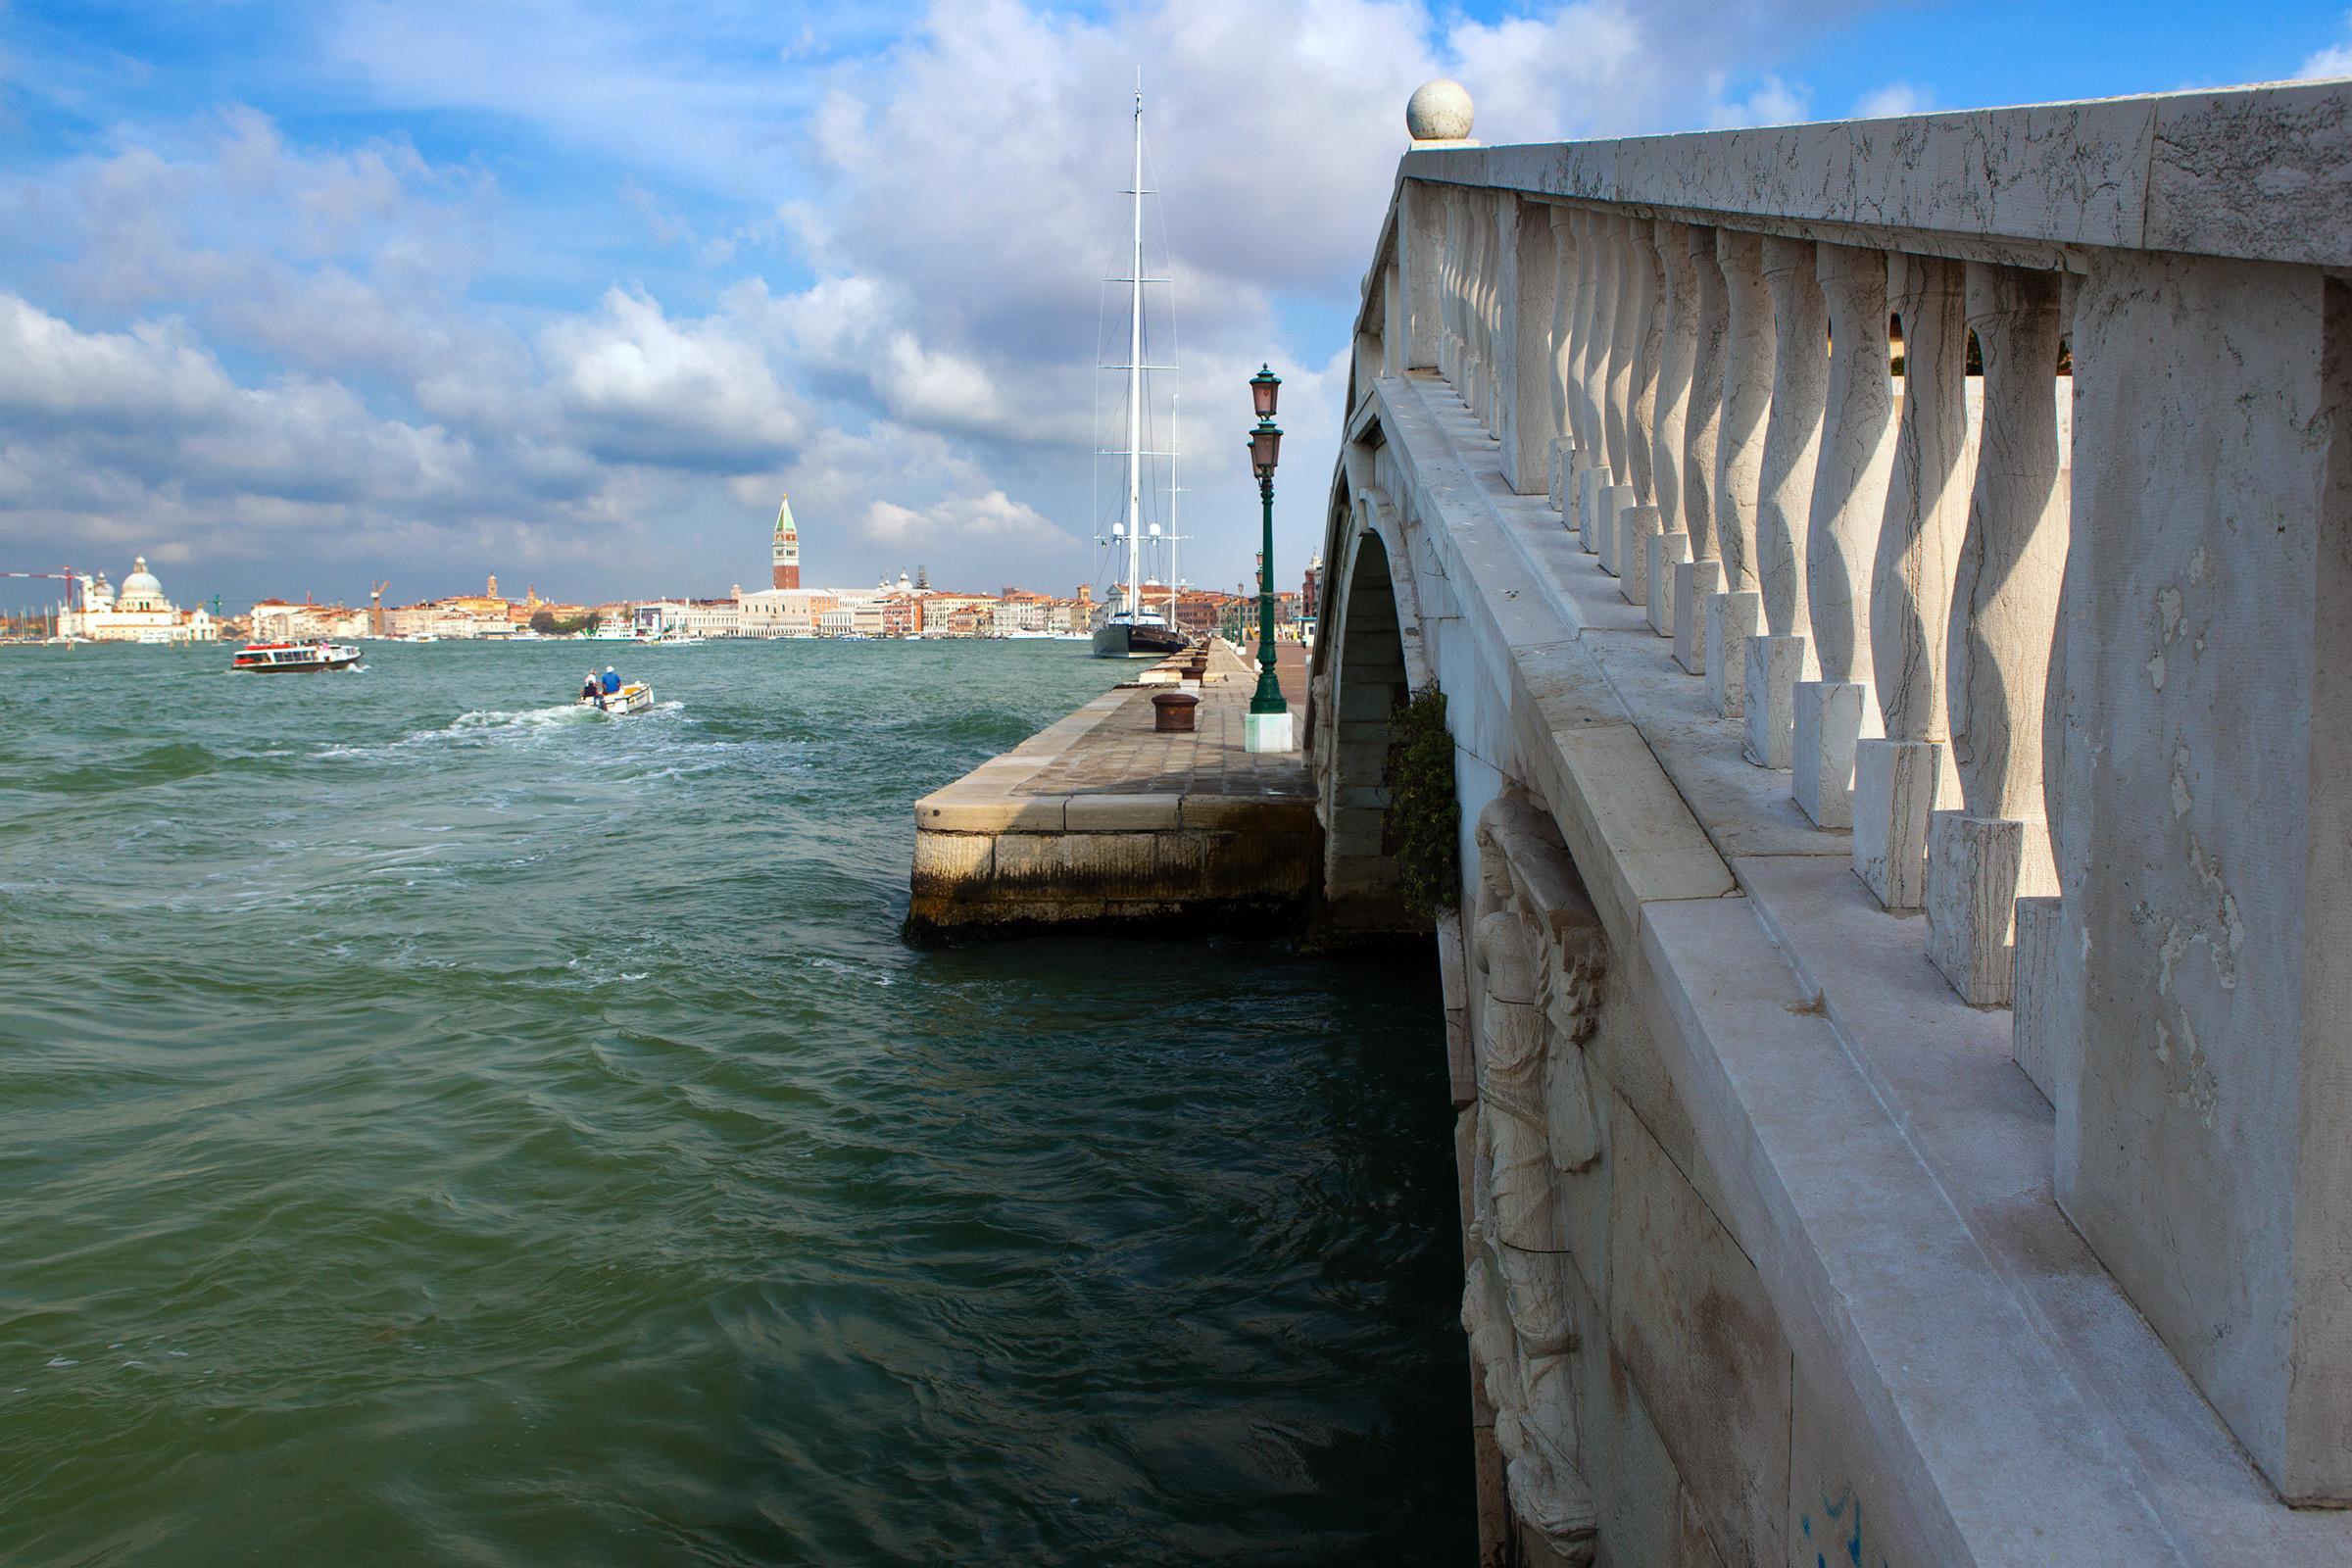 Bridge, Tourism, Italy, Landmark, Light, HQ Photo